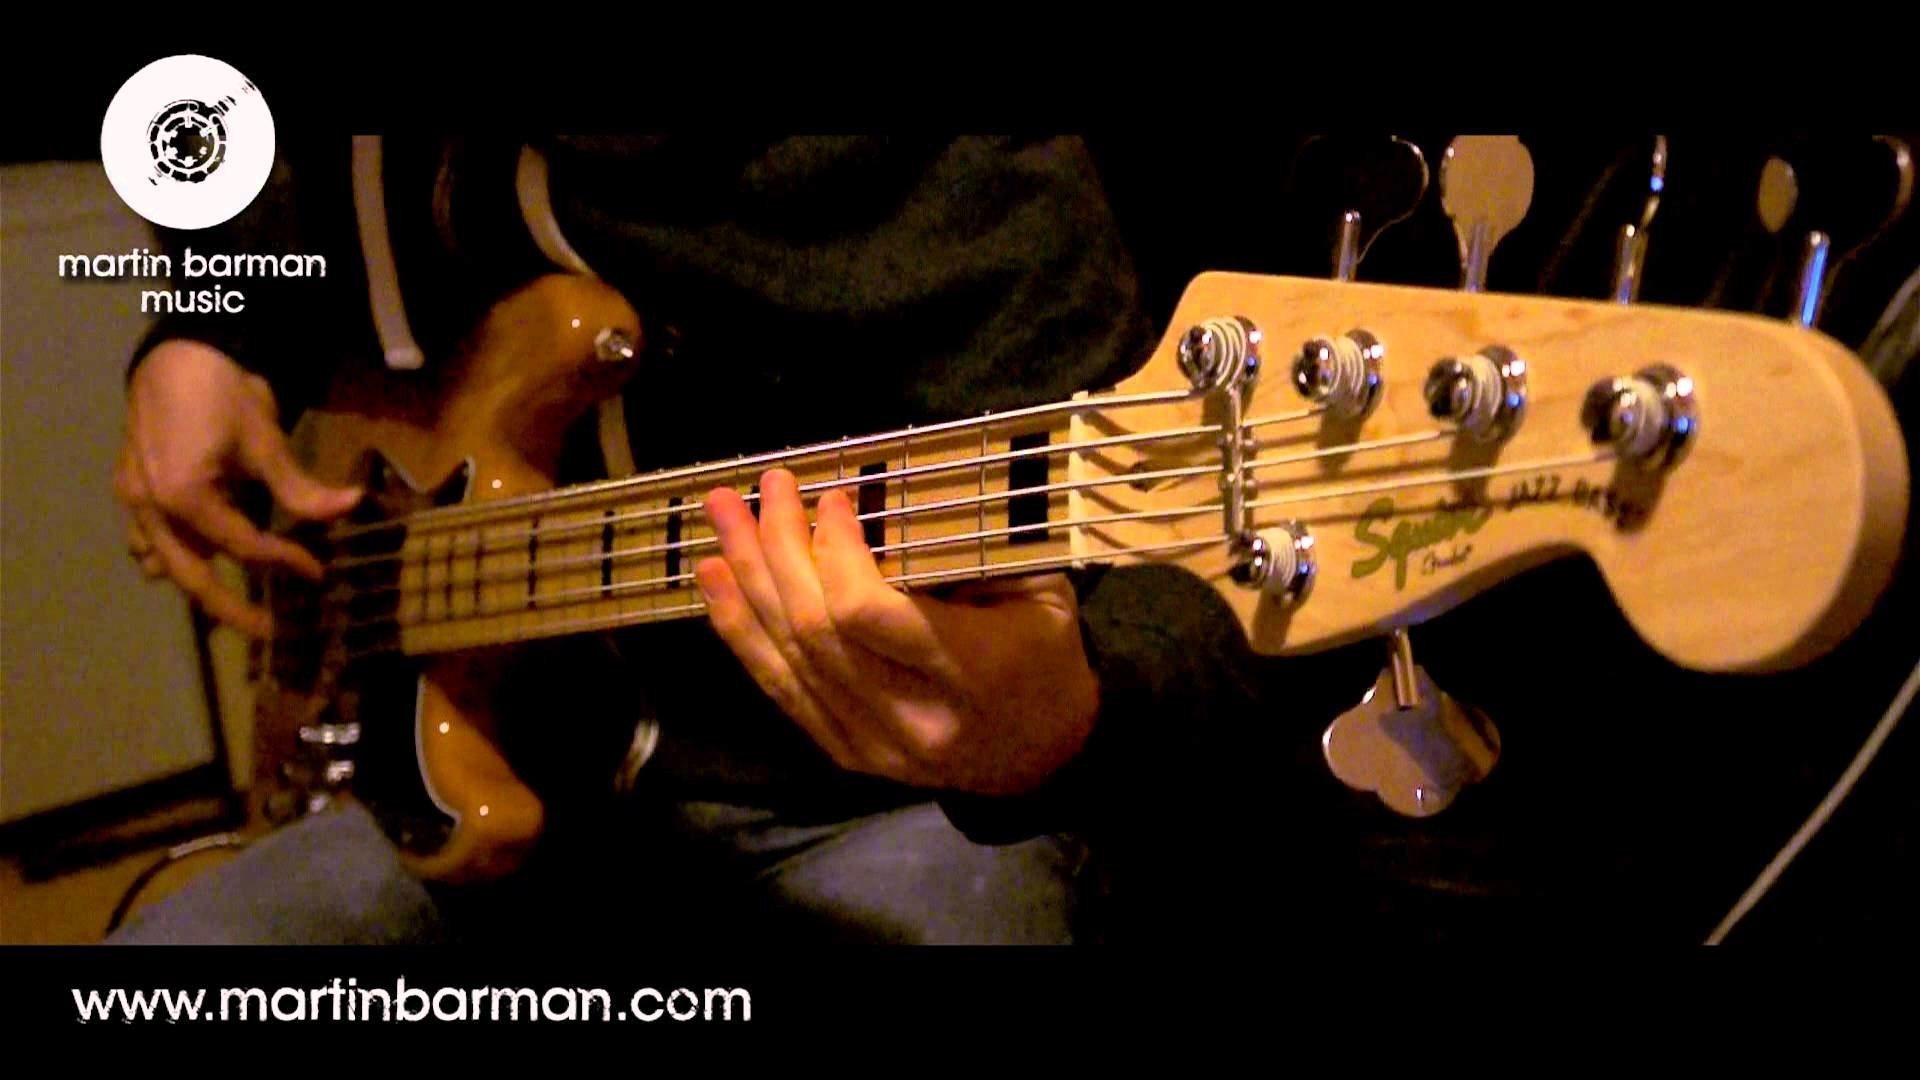 Fender Jazz Bass Head Music Wallpaper HD Free Picture #62991887480